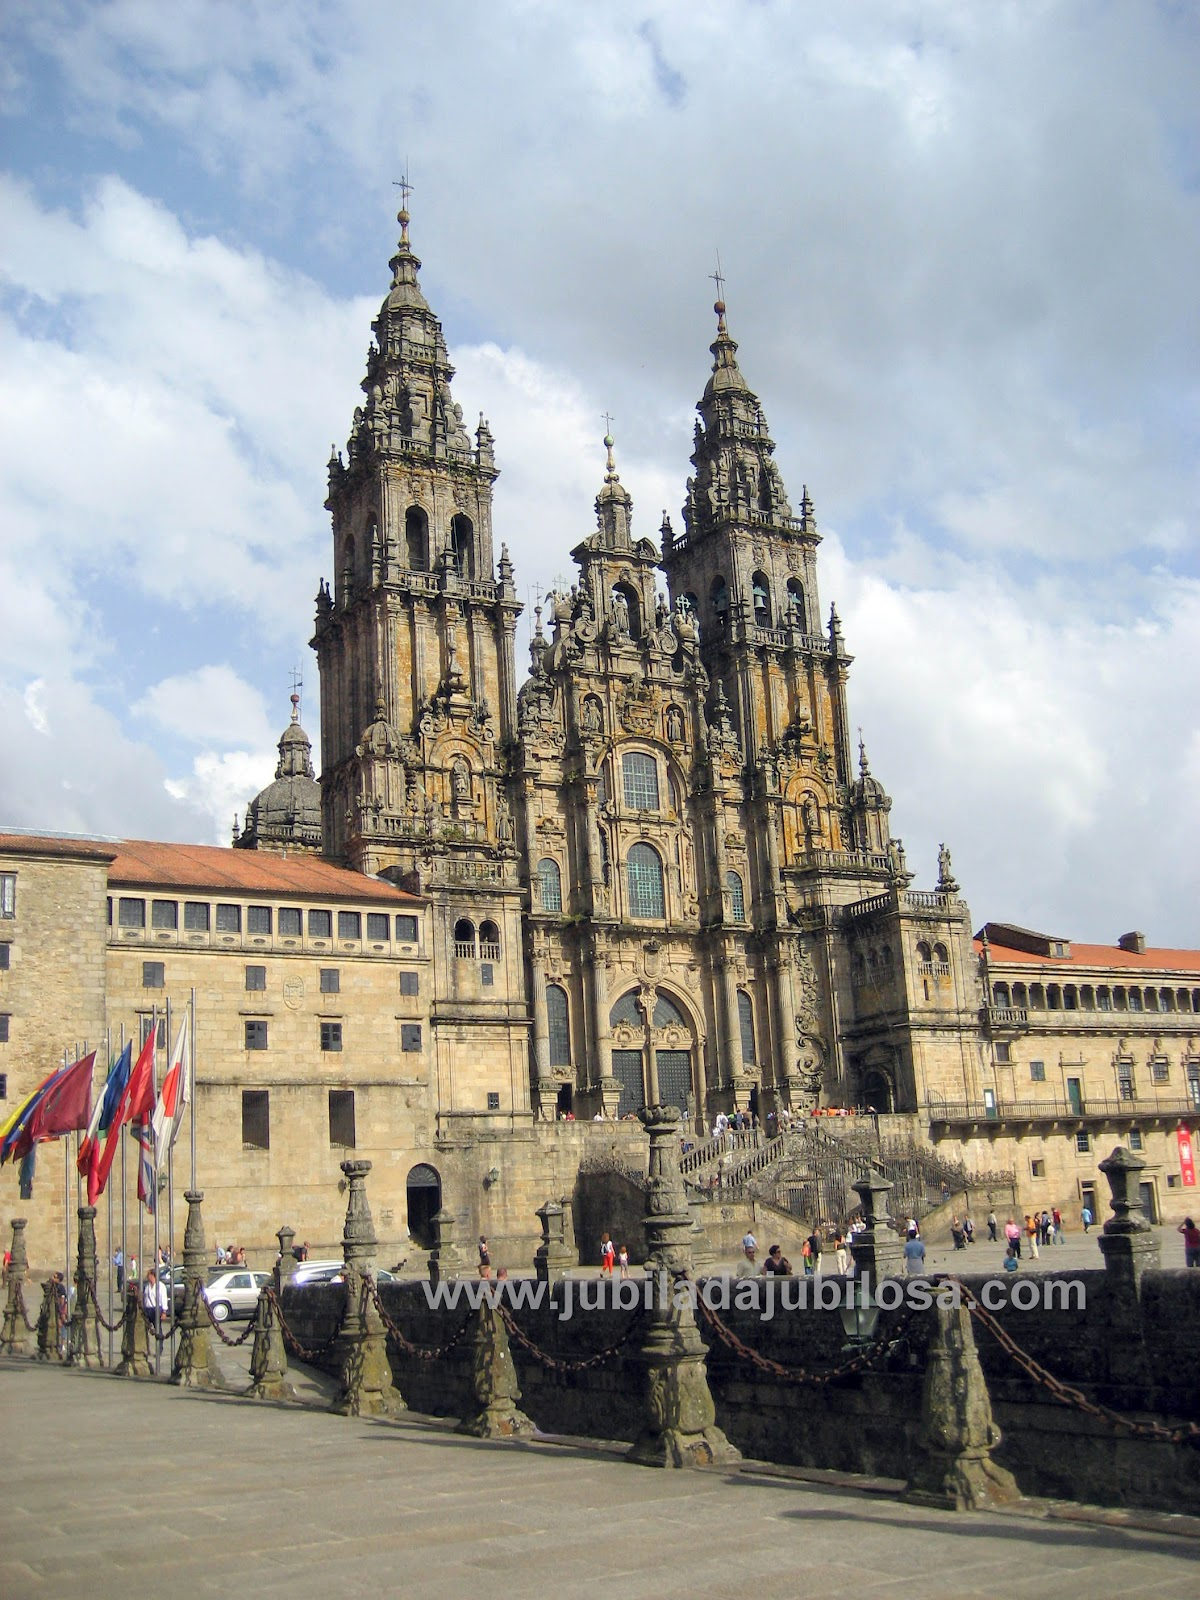 Jubilada jubilosa tejados de catedrales de mil n a for Oficina de turismo santiago de compostela